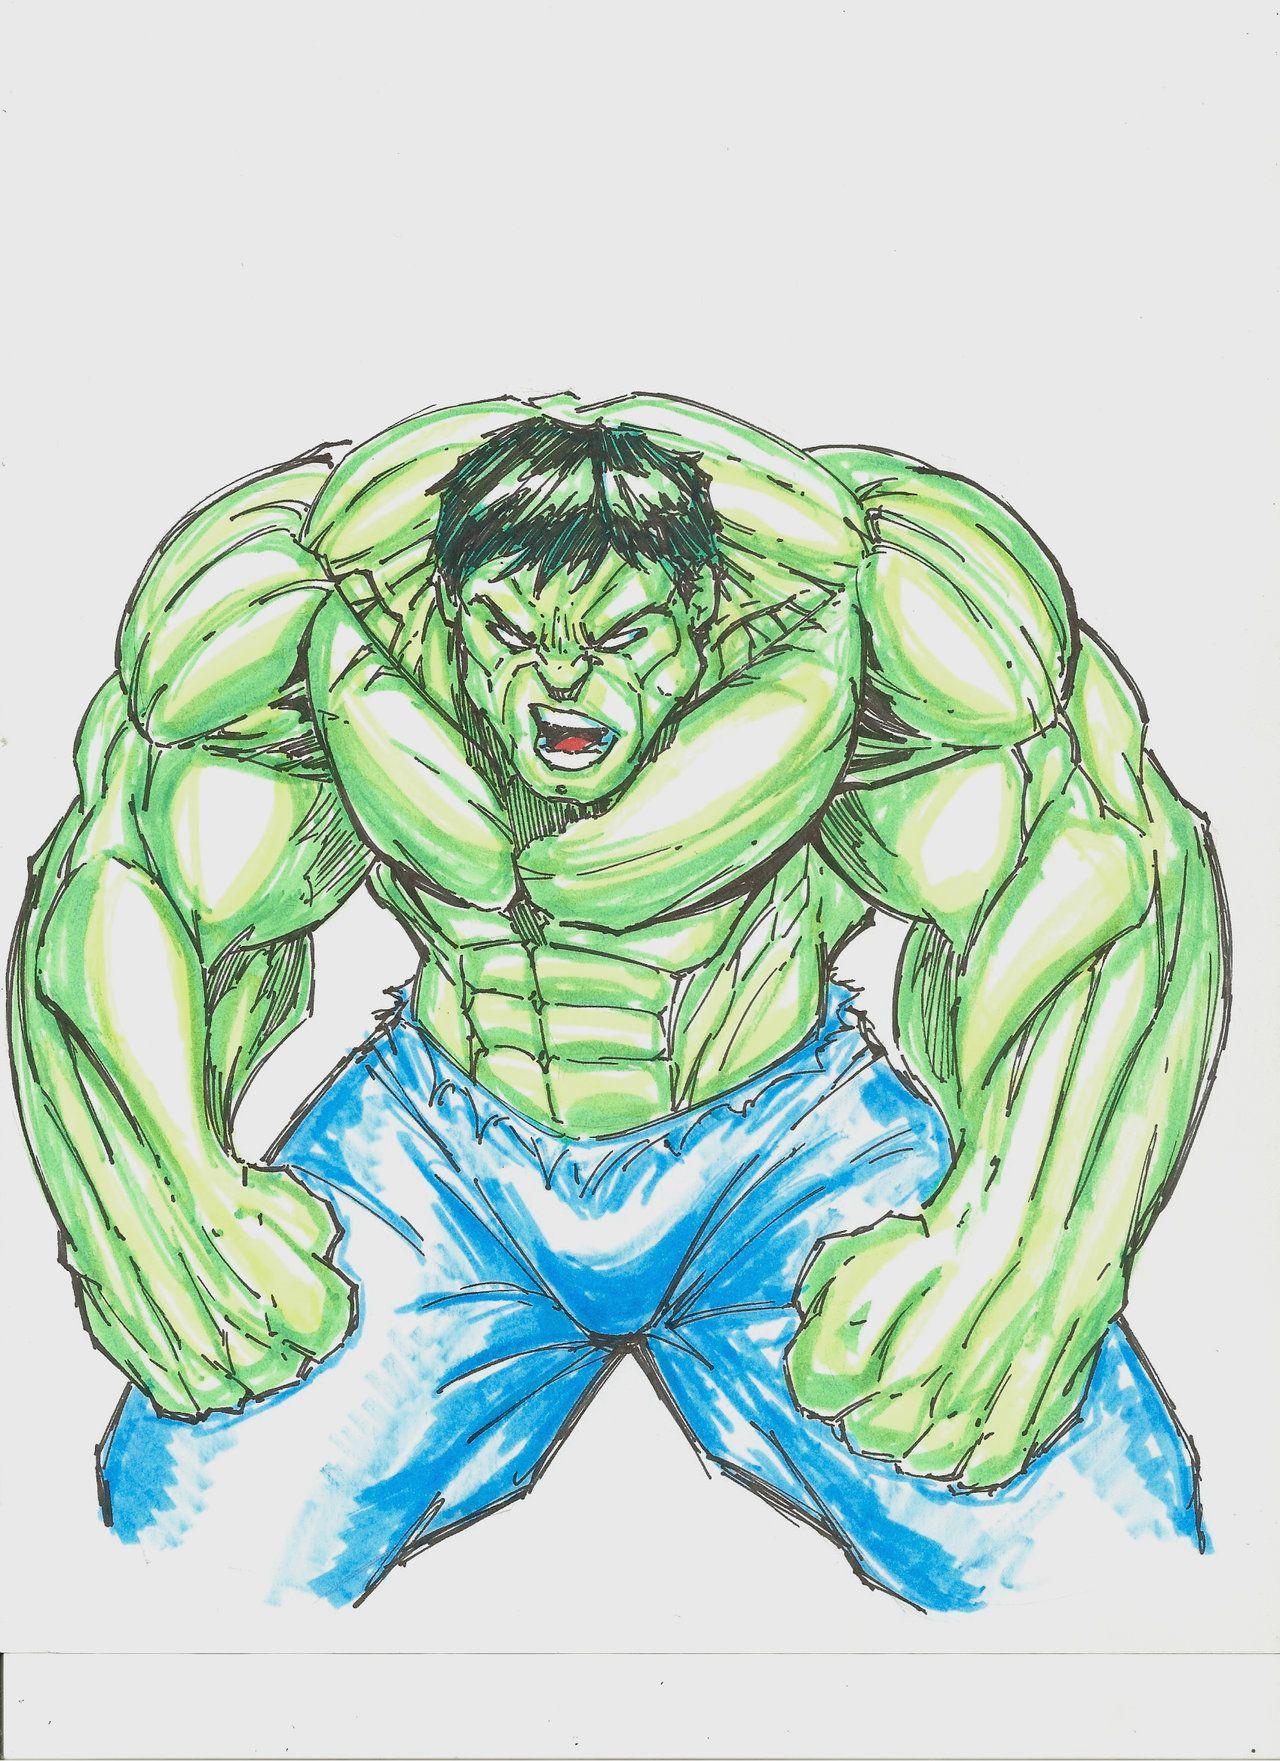 Hulk #Fan #Art. (Quick Hulk) By: Belgerles. (THE * 5 * STÅR * ÅWARD * OF: * AW YEAH, IT'S MAJOR ÅWESOMENESS!!!™) ÅÅÅ+